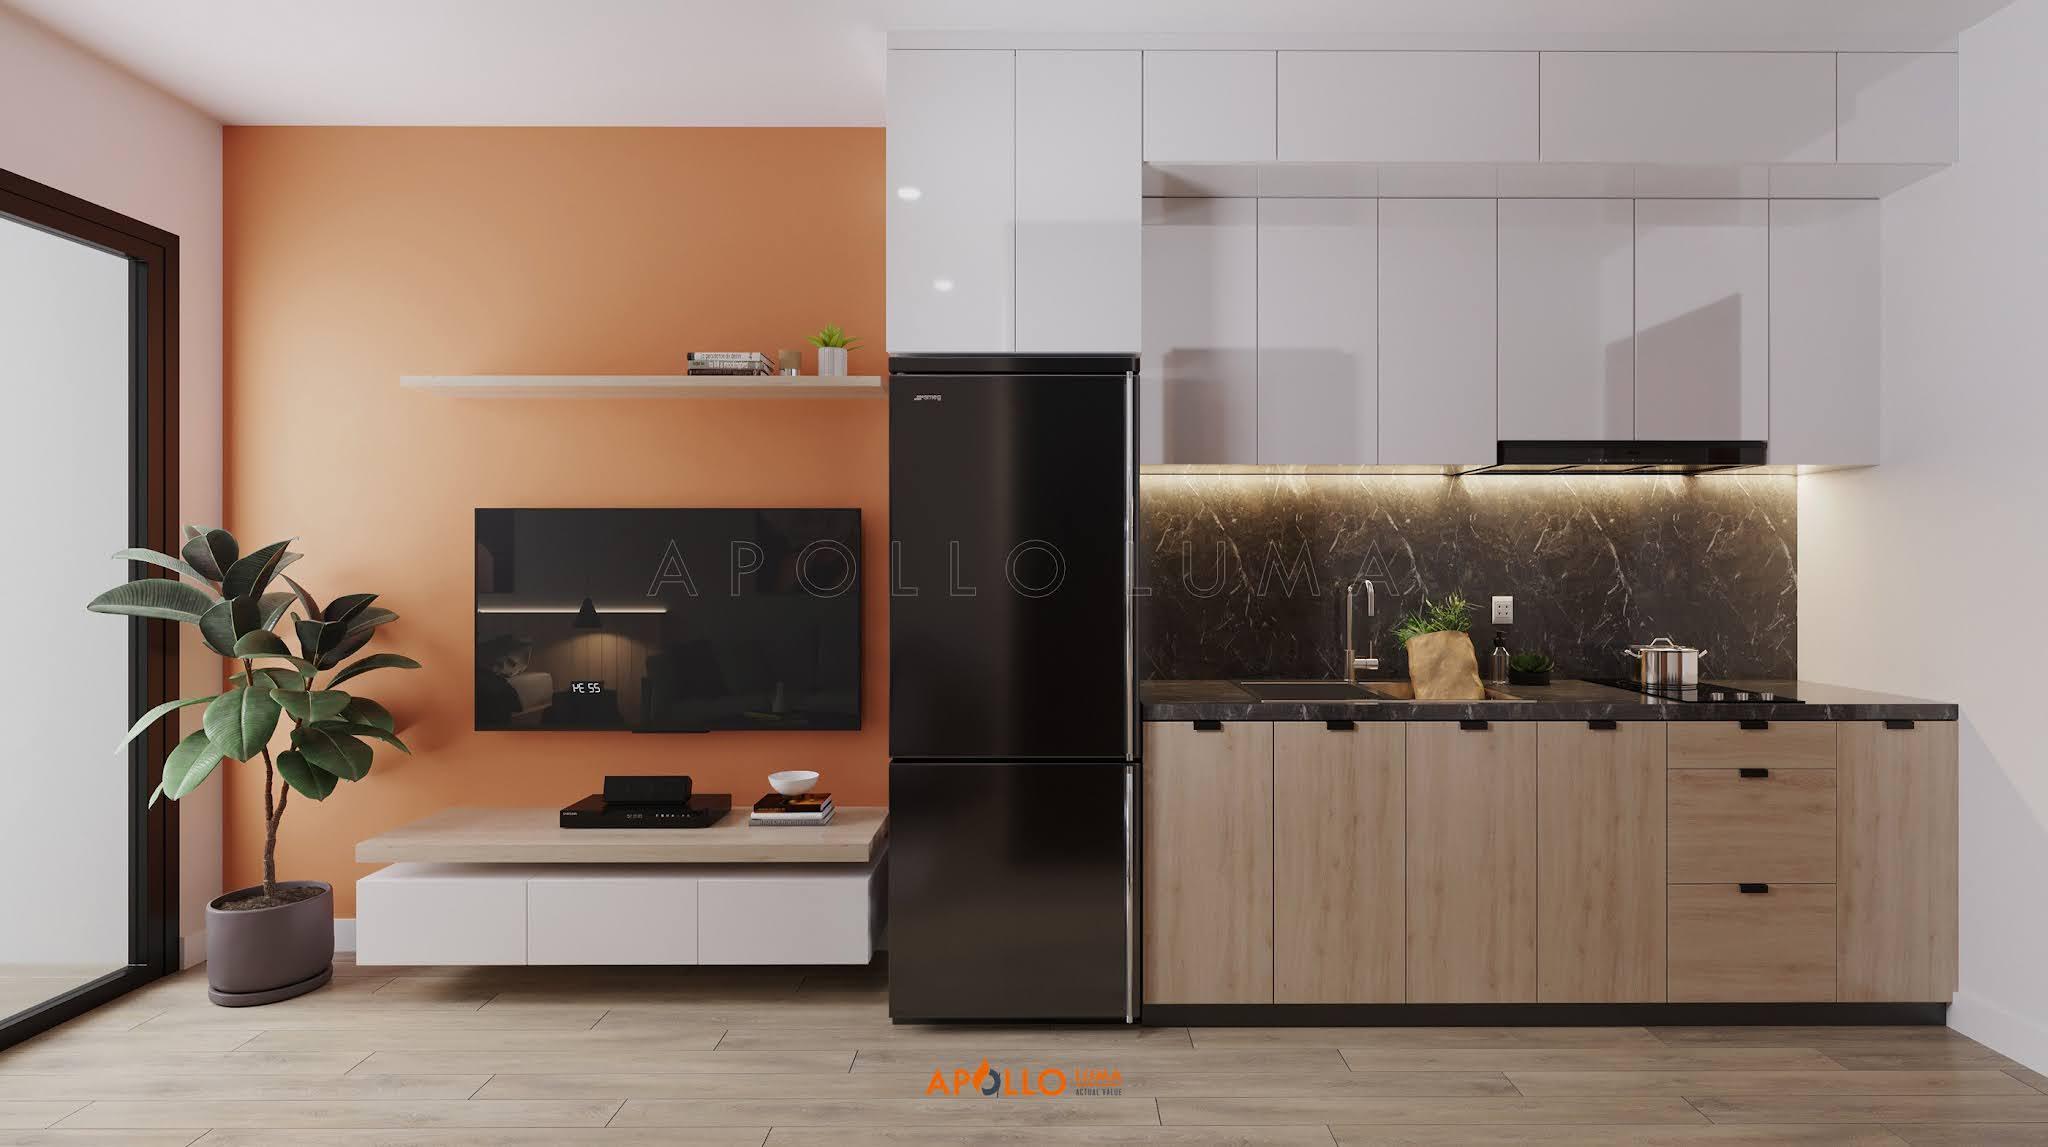 Thiết kế nội thất căn hộ Studio (28m2) S1.02-22 Vinhomes Ocean Park Gia Lâm